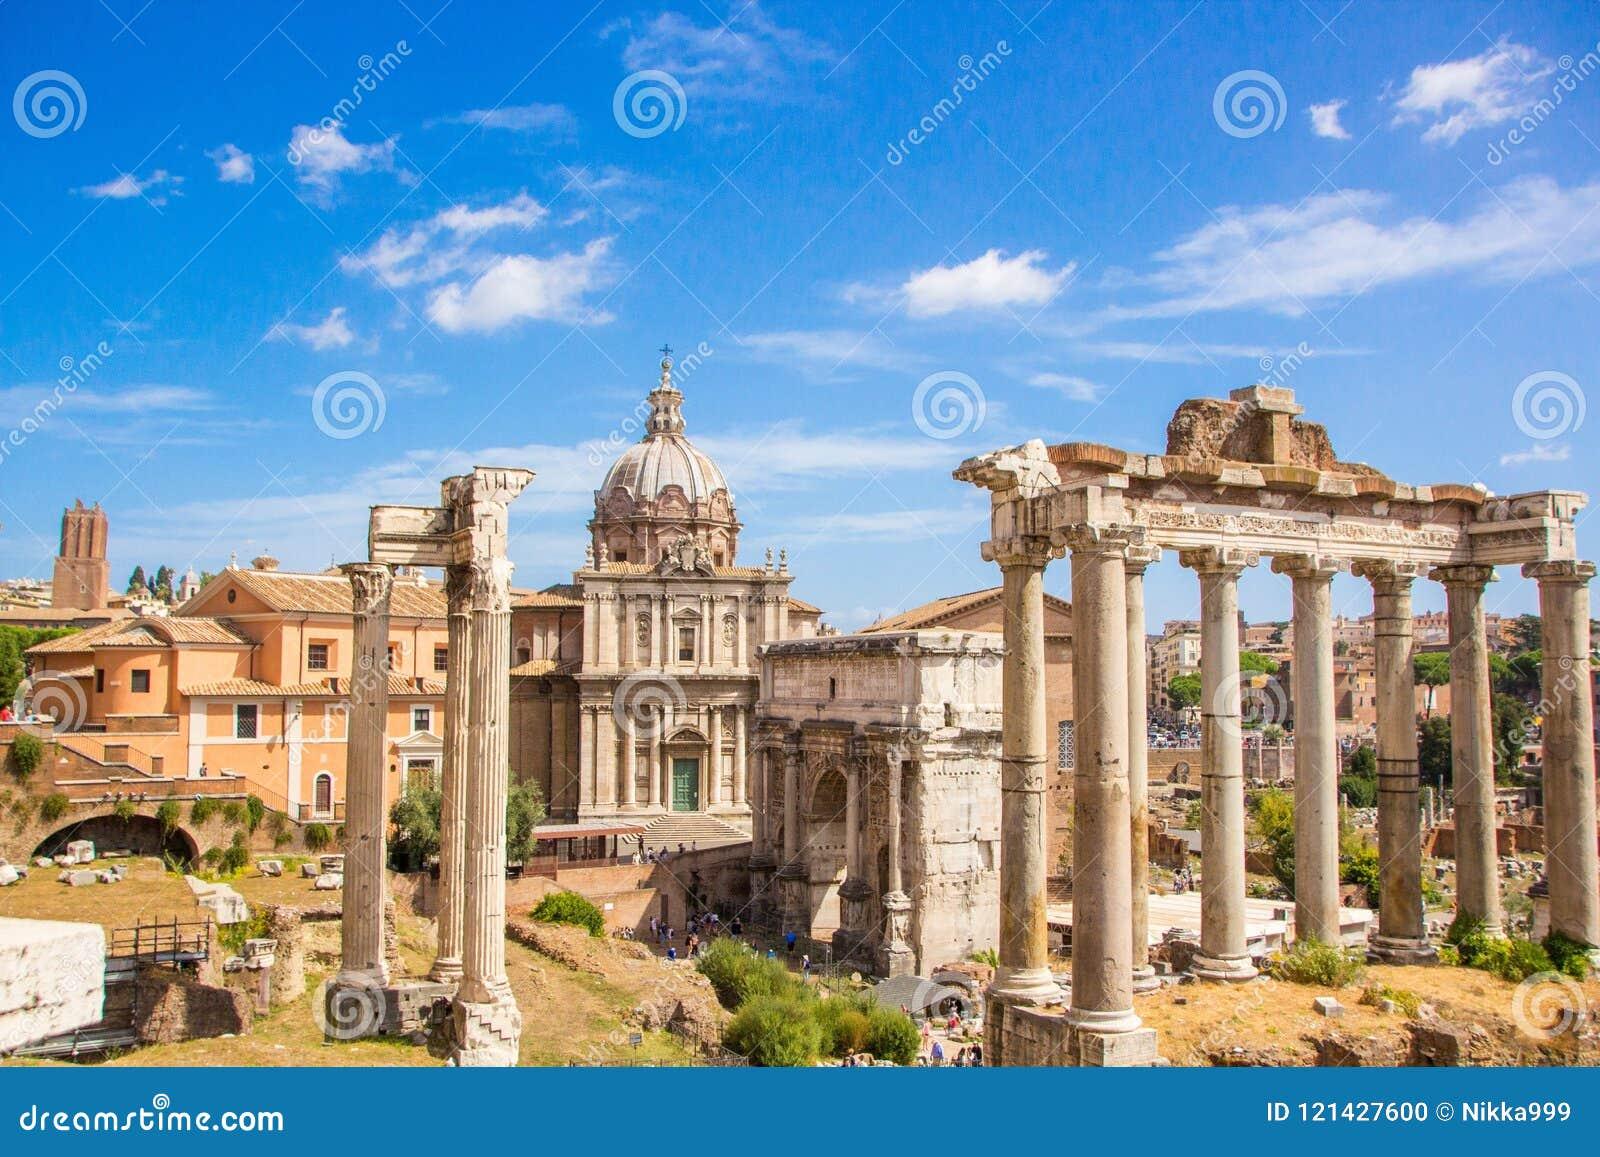 Rome, Italië - September 12, 2017: Toneel oude ruïnes van Roman Forum Foro Romano in Rome, Italië